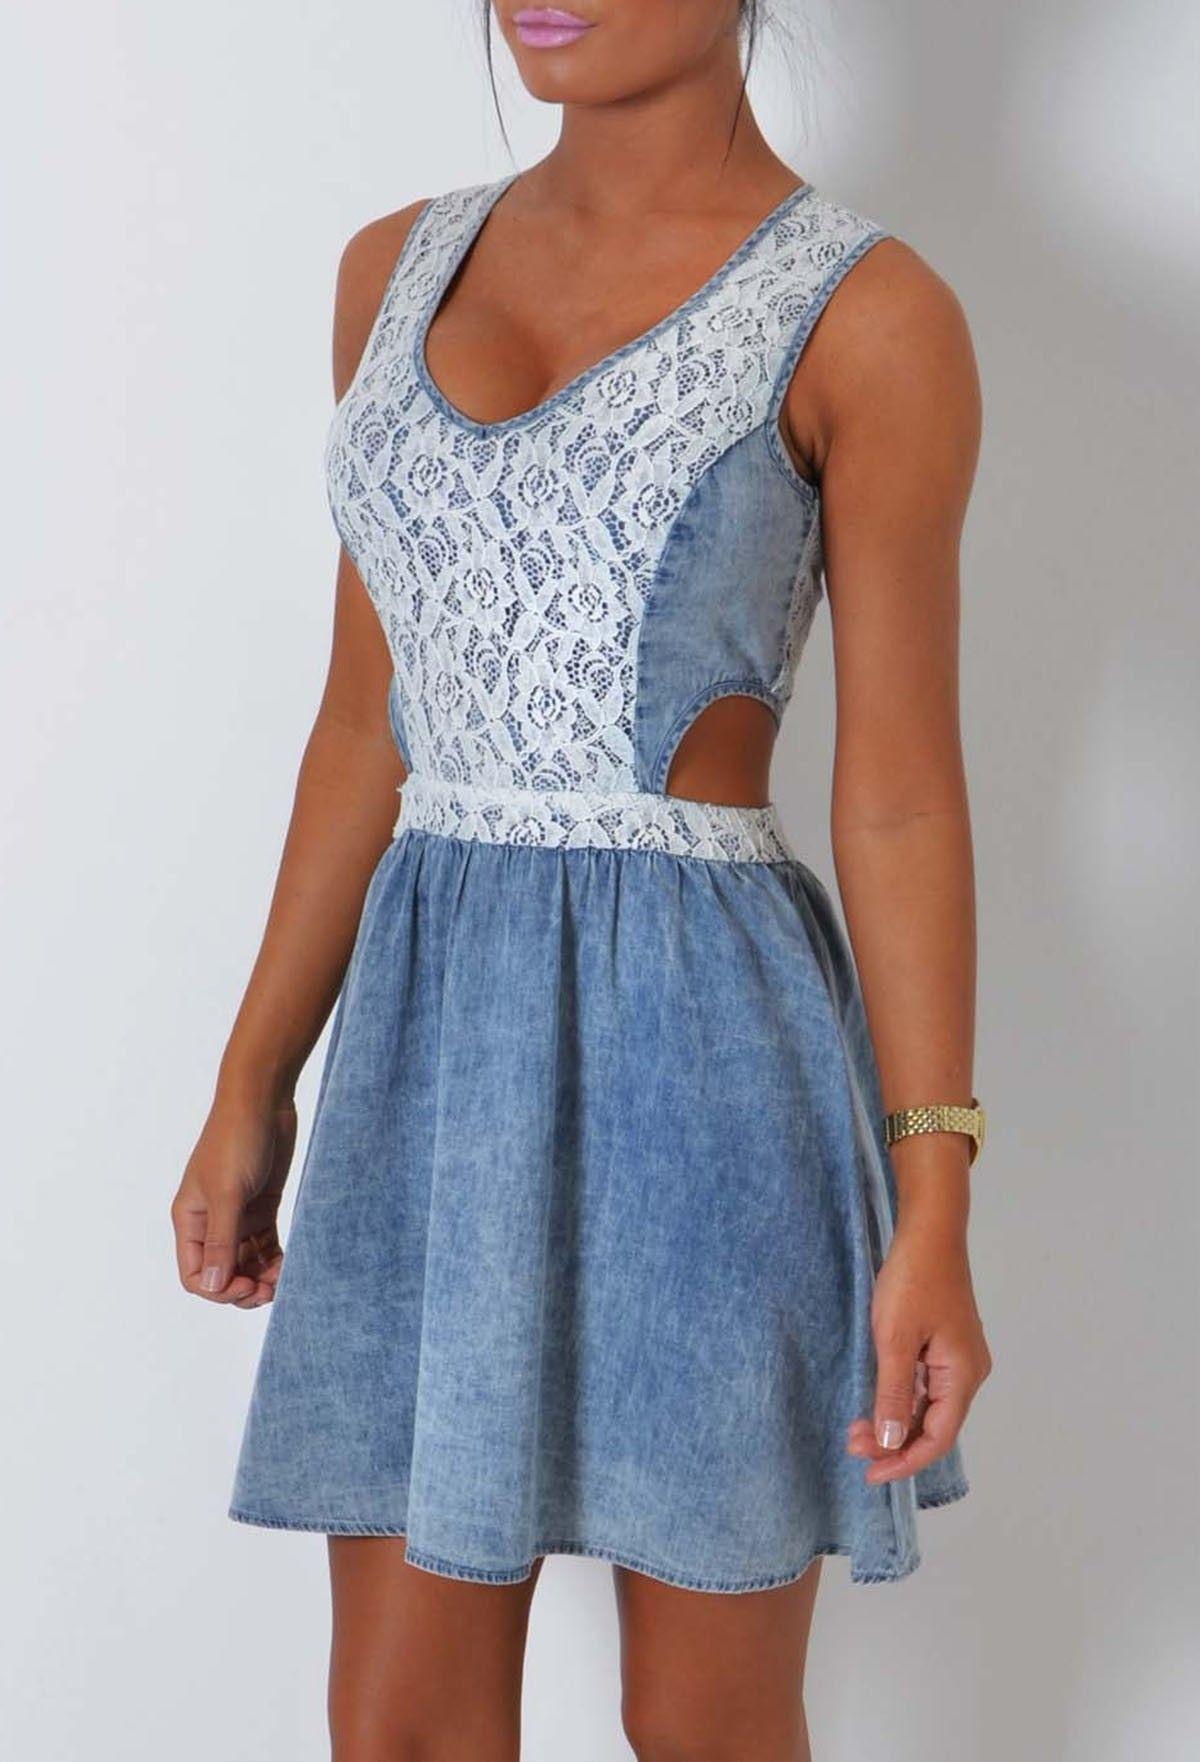 20a47a90dc Rock Away Blue Denim and Lace Skater Dress - 8